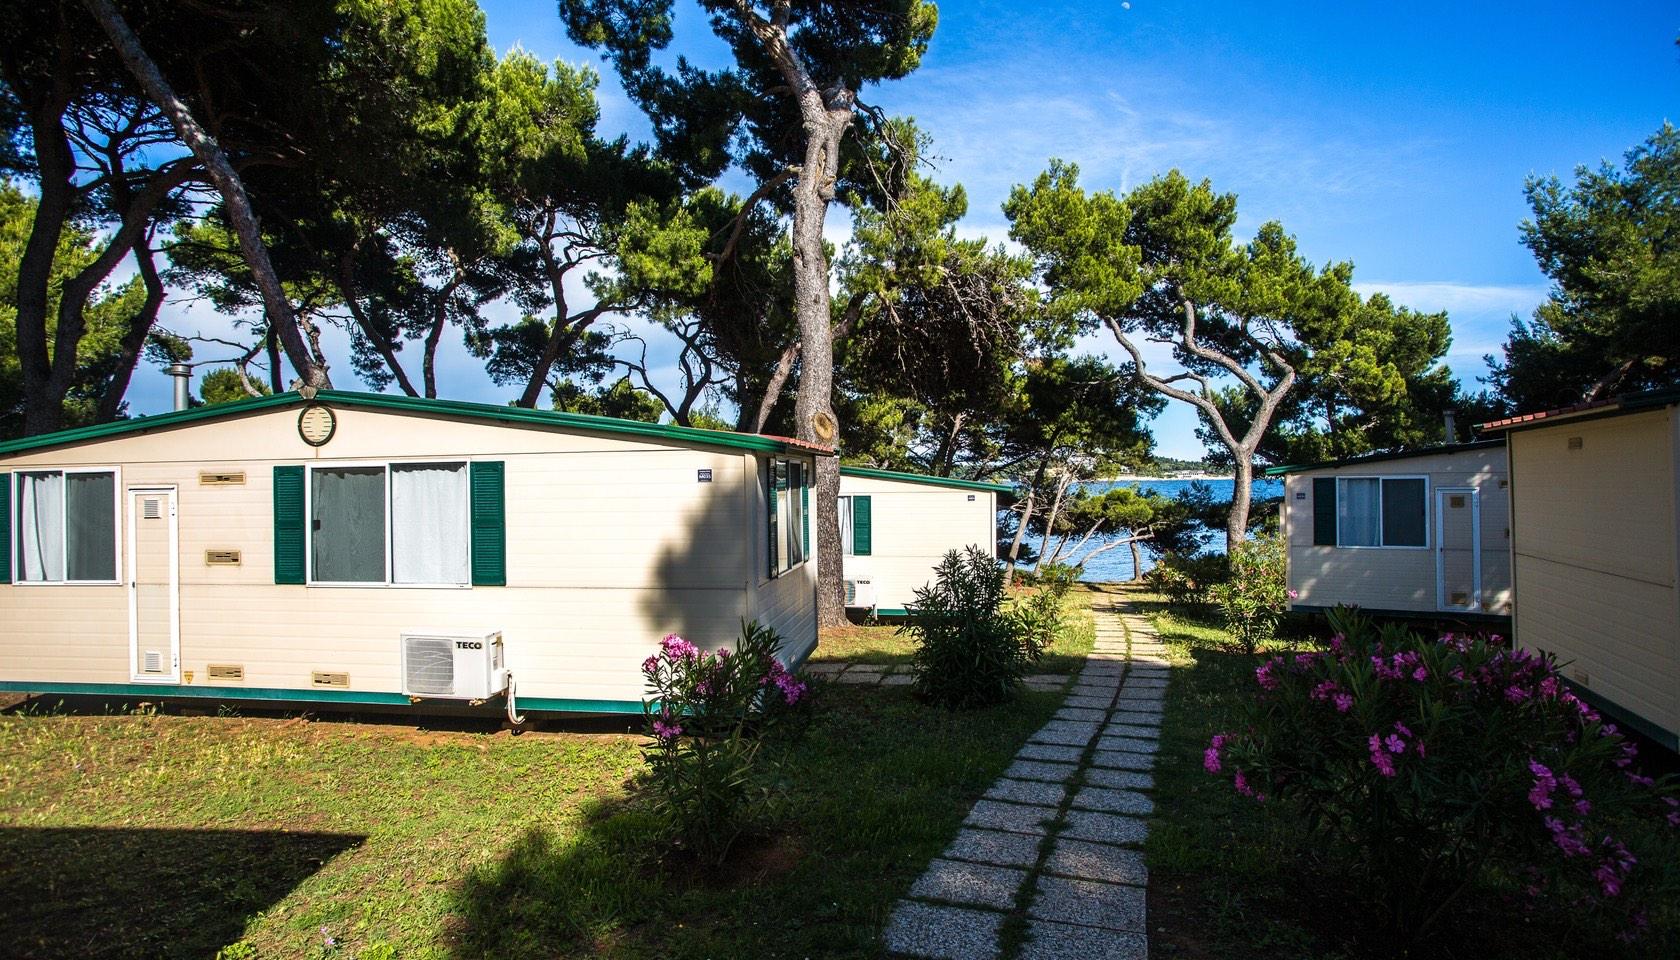 Mobile homes arena stoja mobile homes pula arenacamps - Vivre en mobil home ...